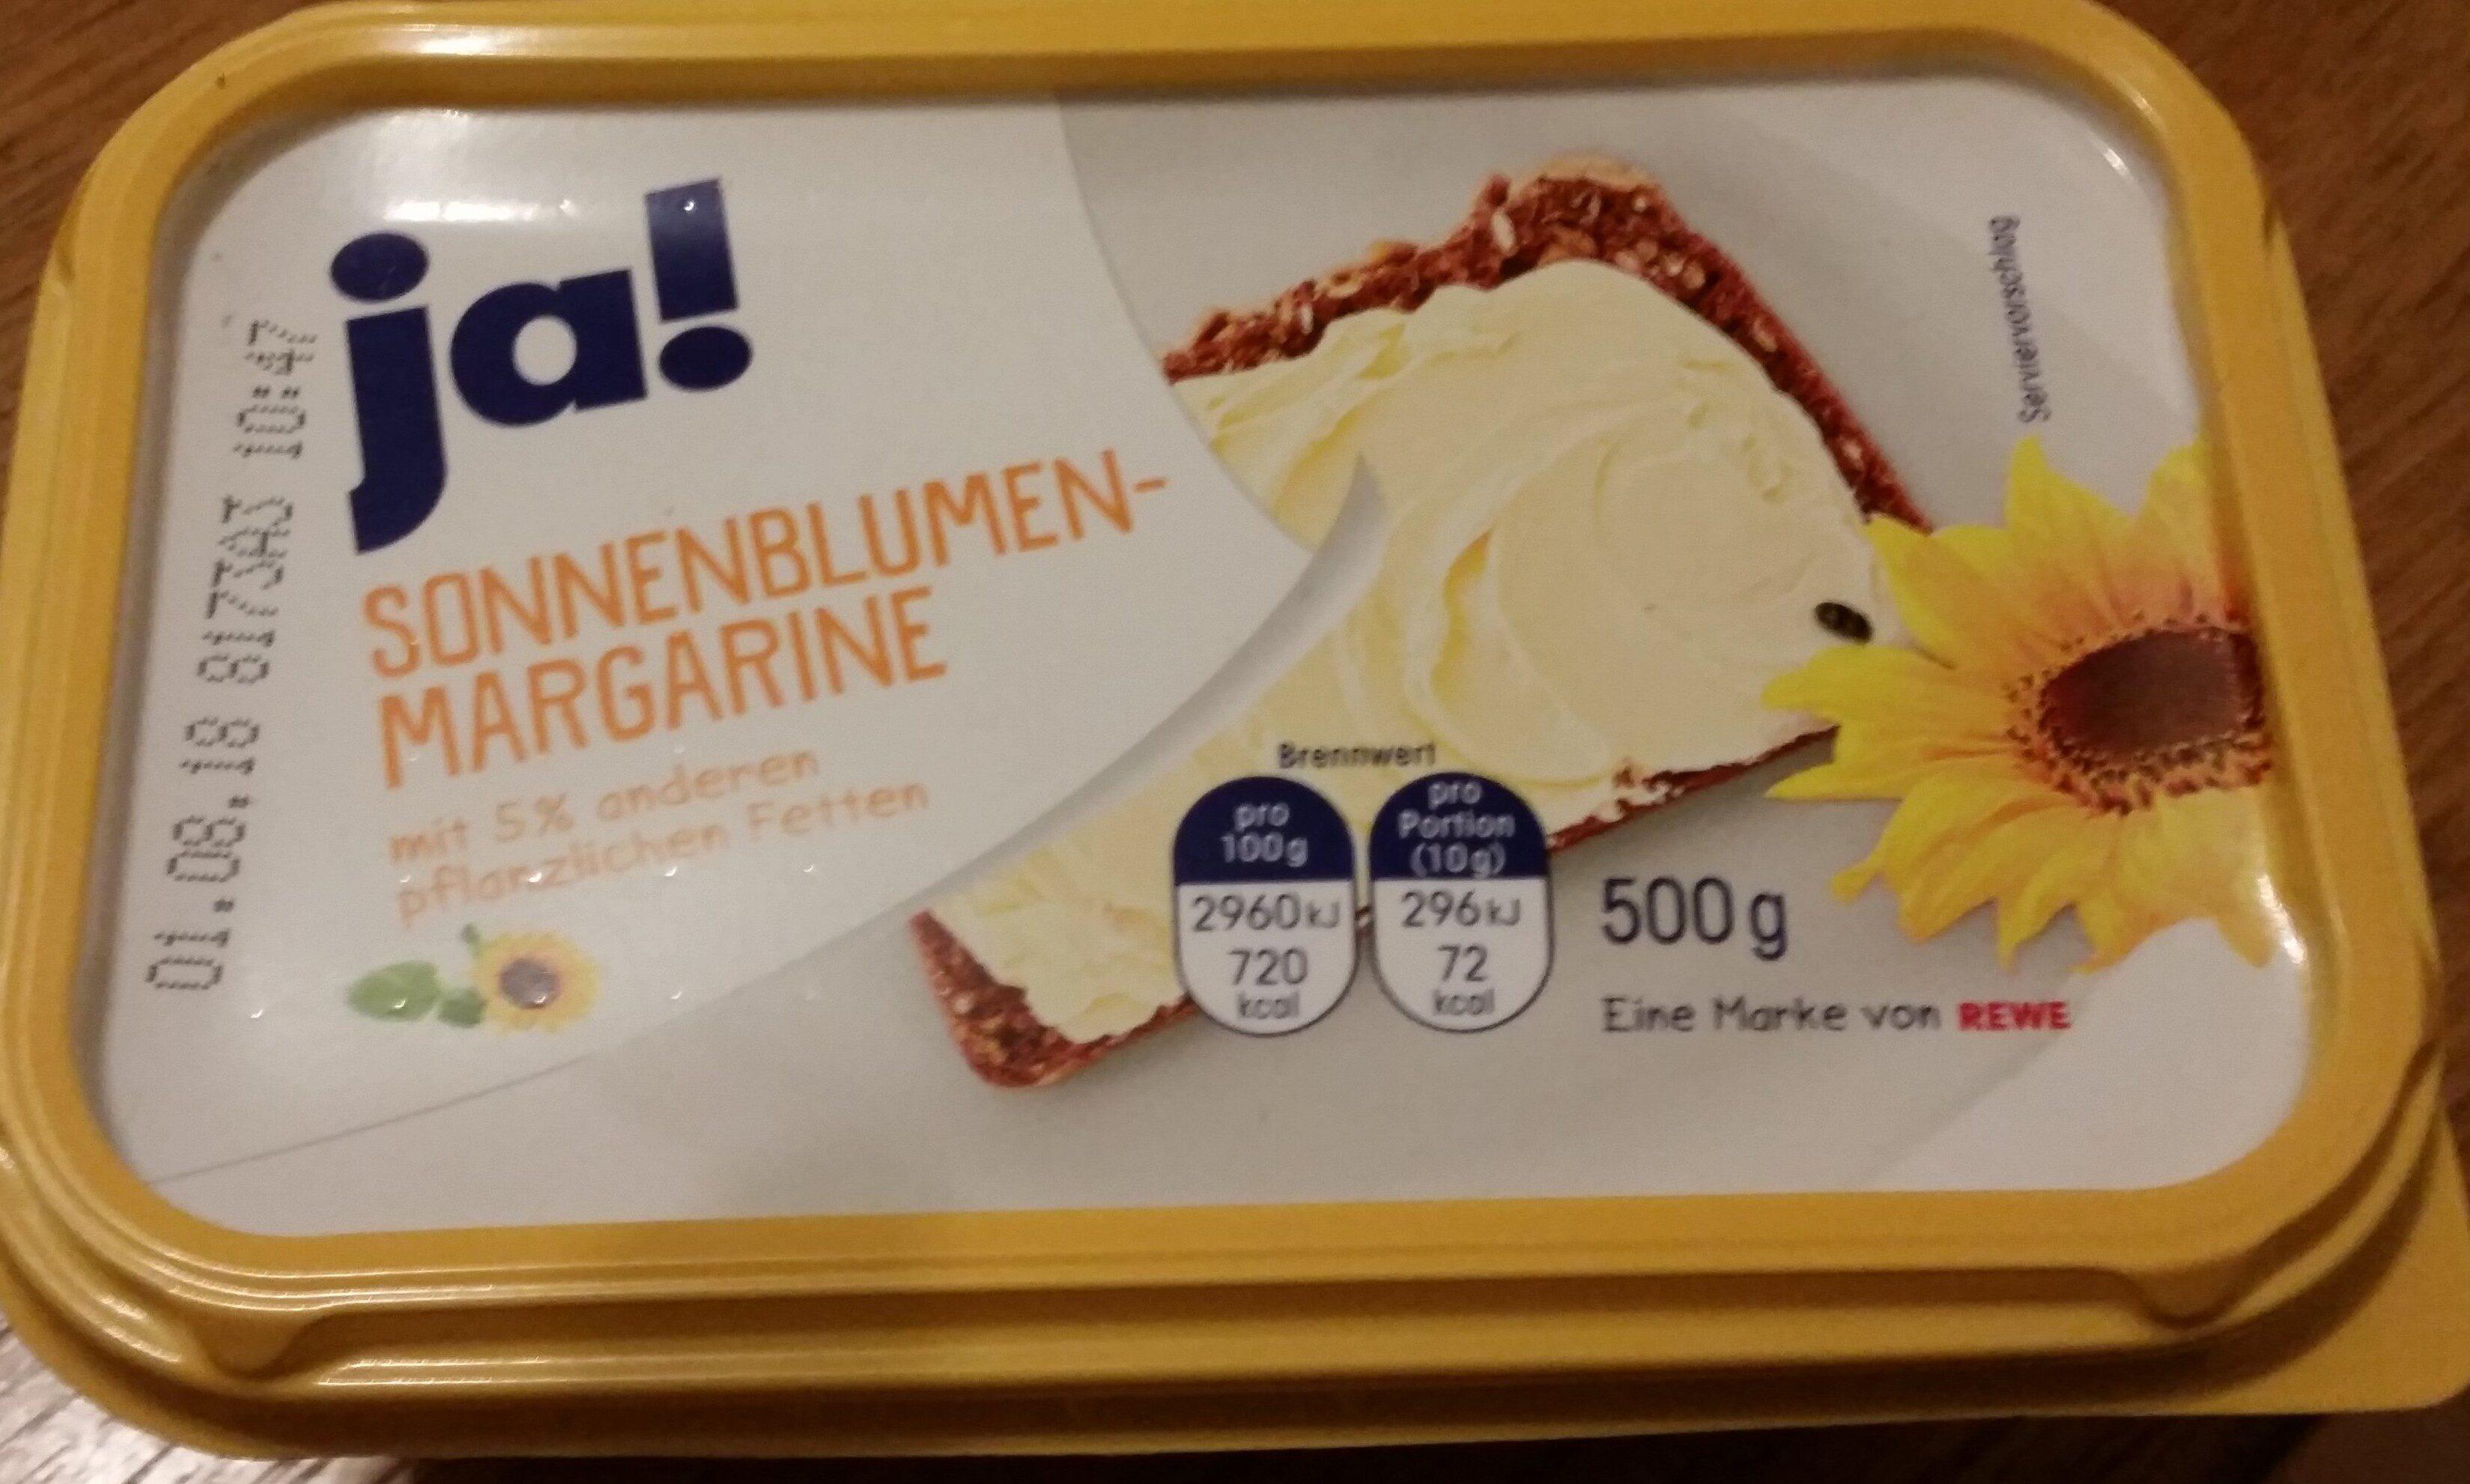 Sonnenblumen Margarine - Product - de